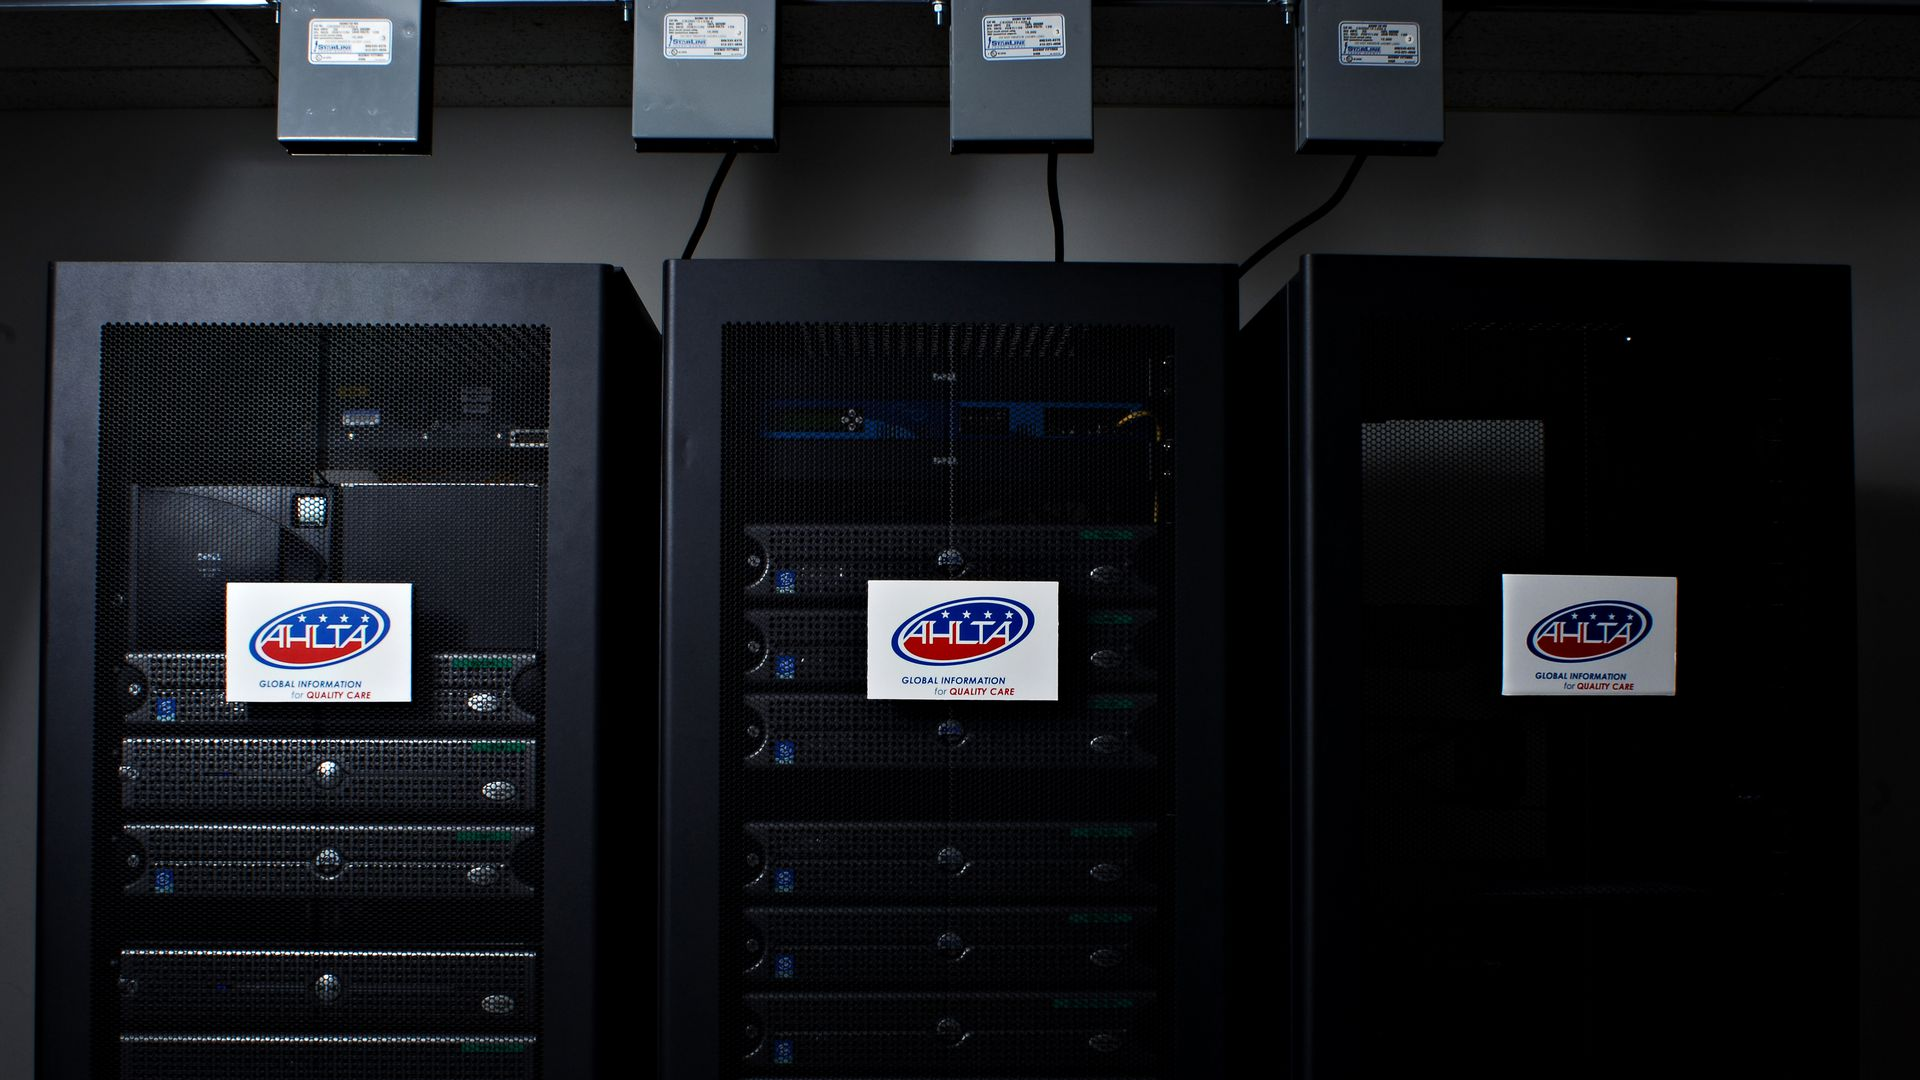 Electronic servers